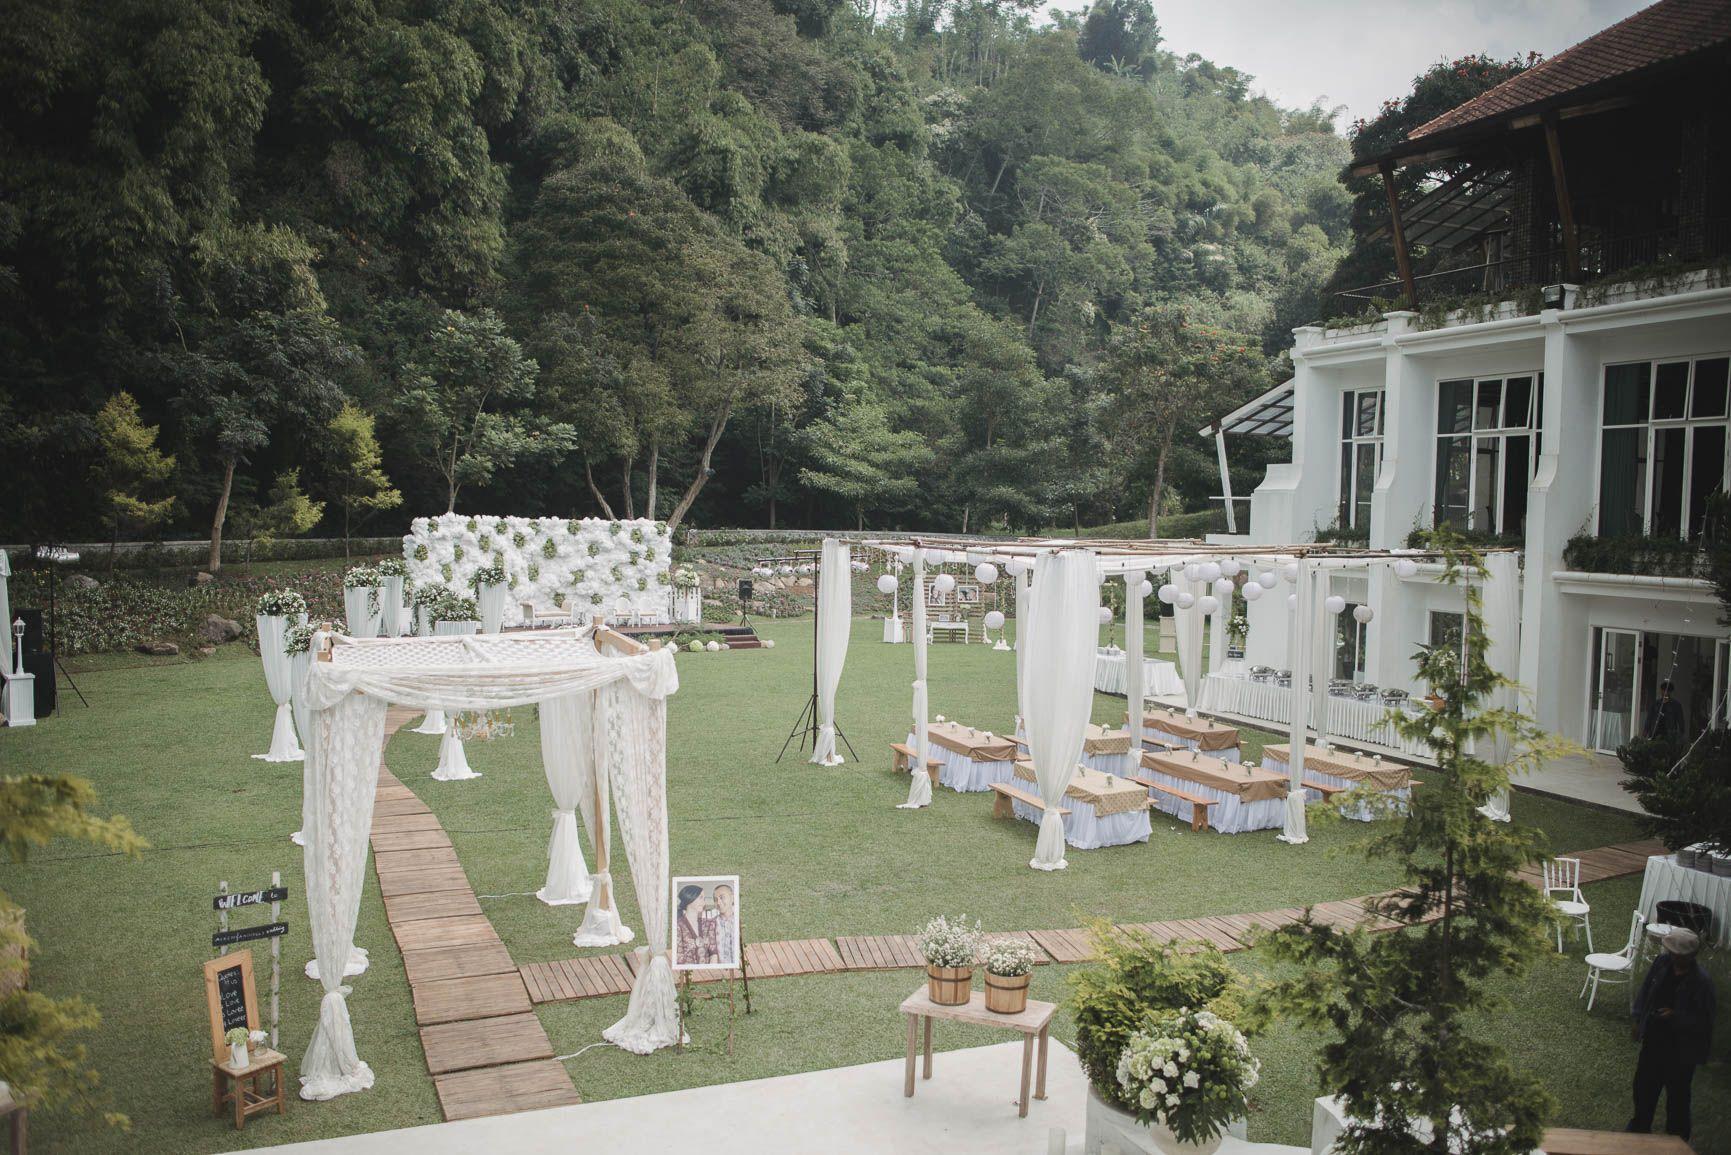 Outdoor wedding at gedong putih ala anindya and aiken owlsome 107 outdoor wedding at gedong putih ala anindya and aiken owlsome 107 of 167 junglespirit Choice Image